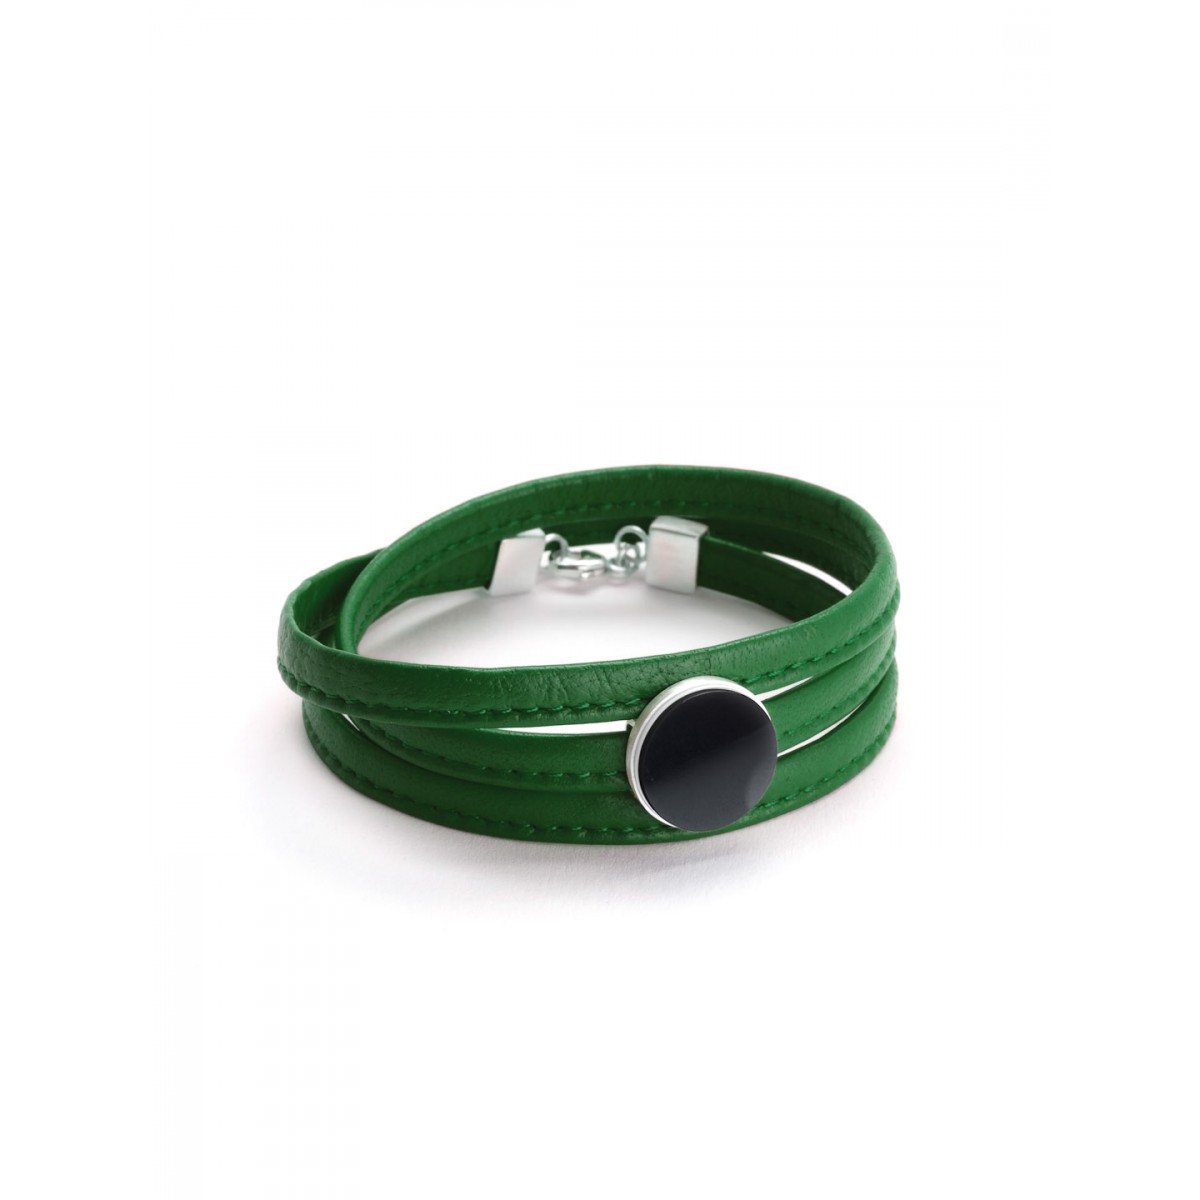 "Eva Slotta Jewellery ""Tint Deep"" Armband mit grünem Nappaleder und schwarzem Hämatit, 925 Silber"